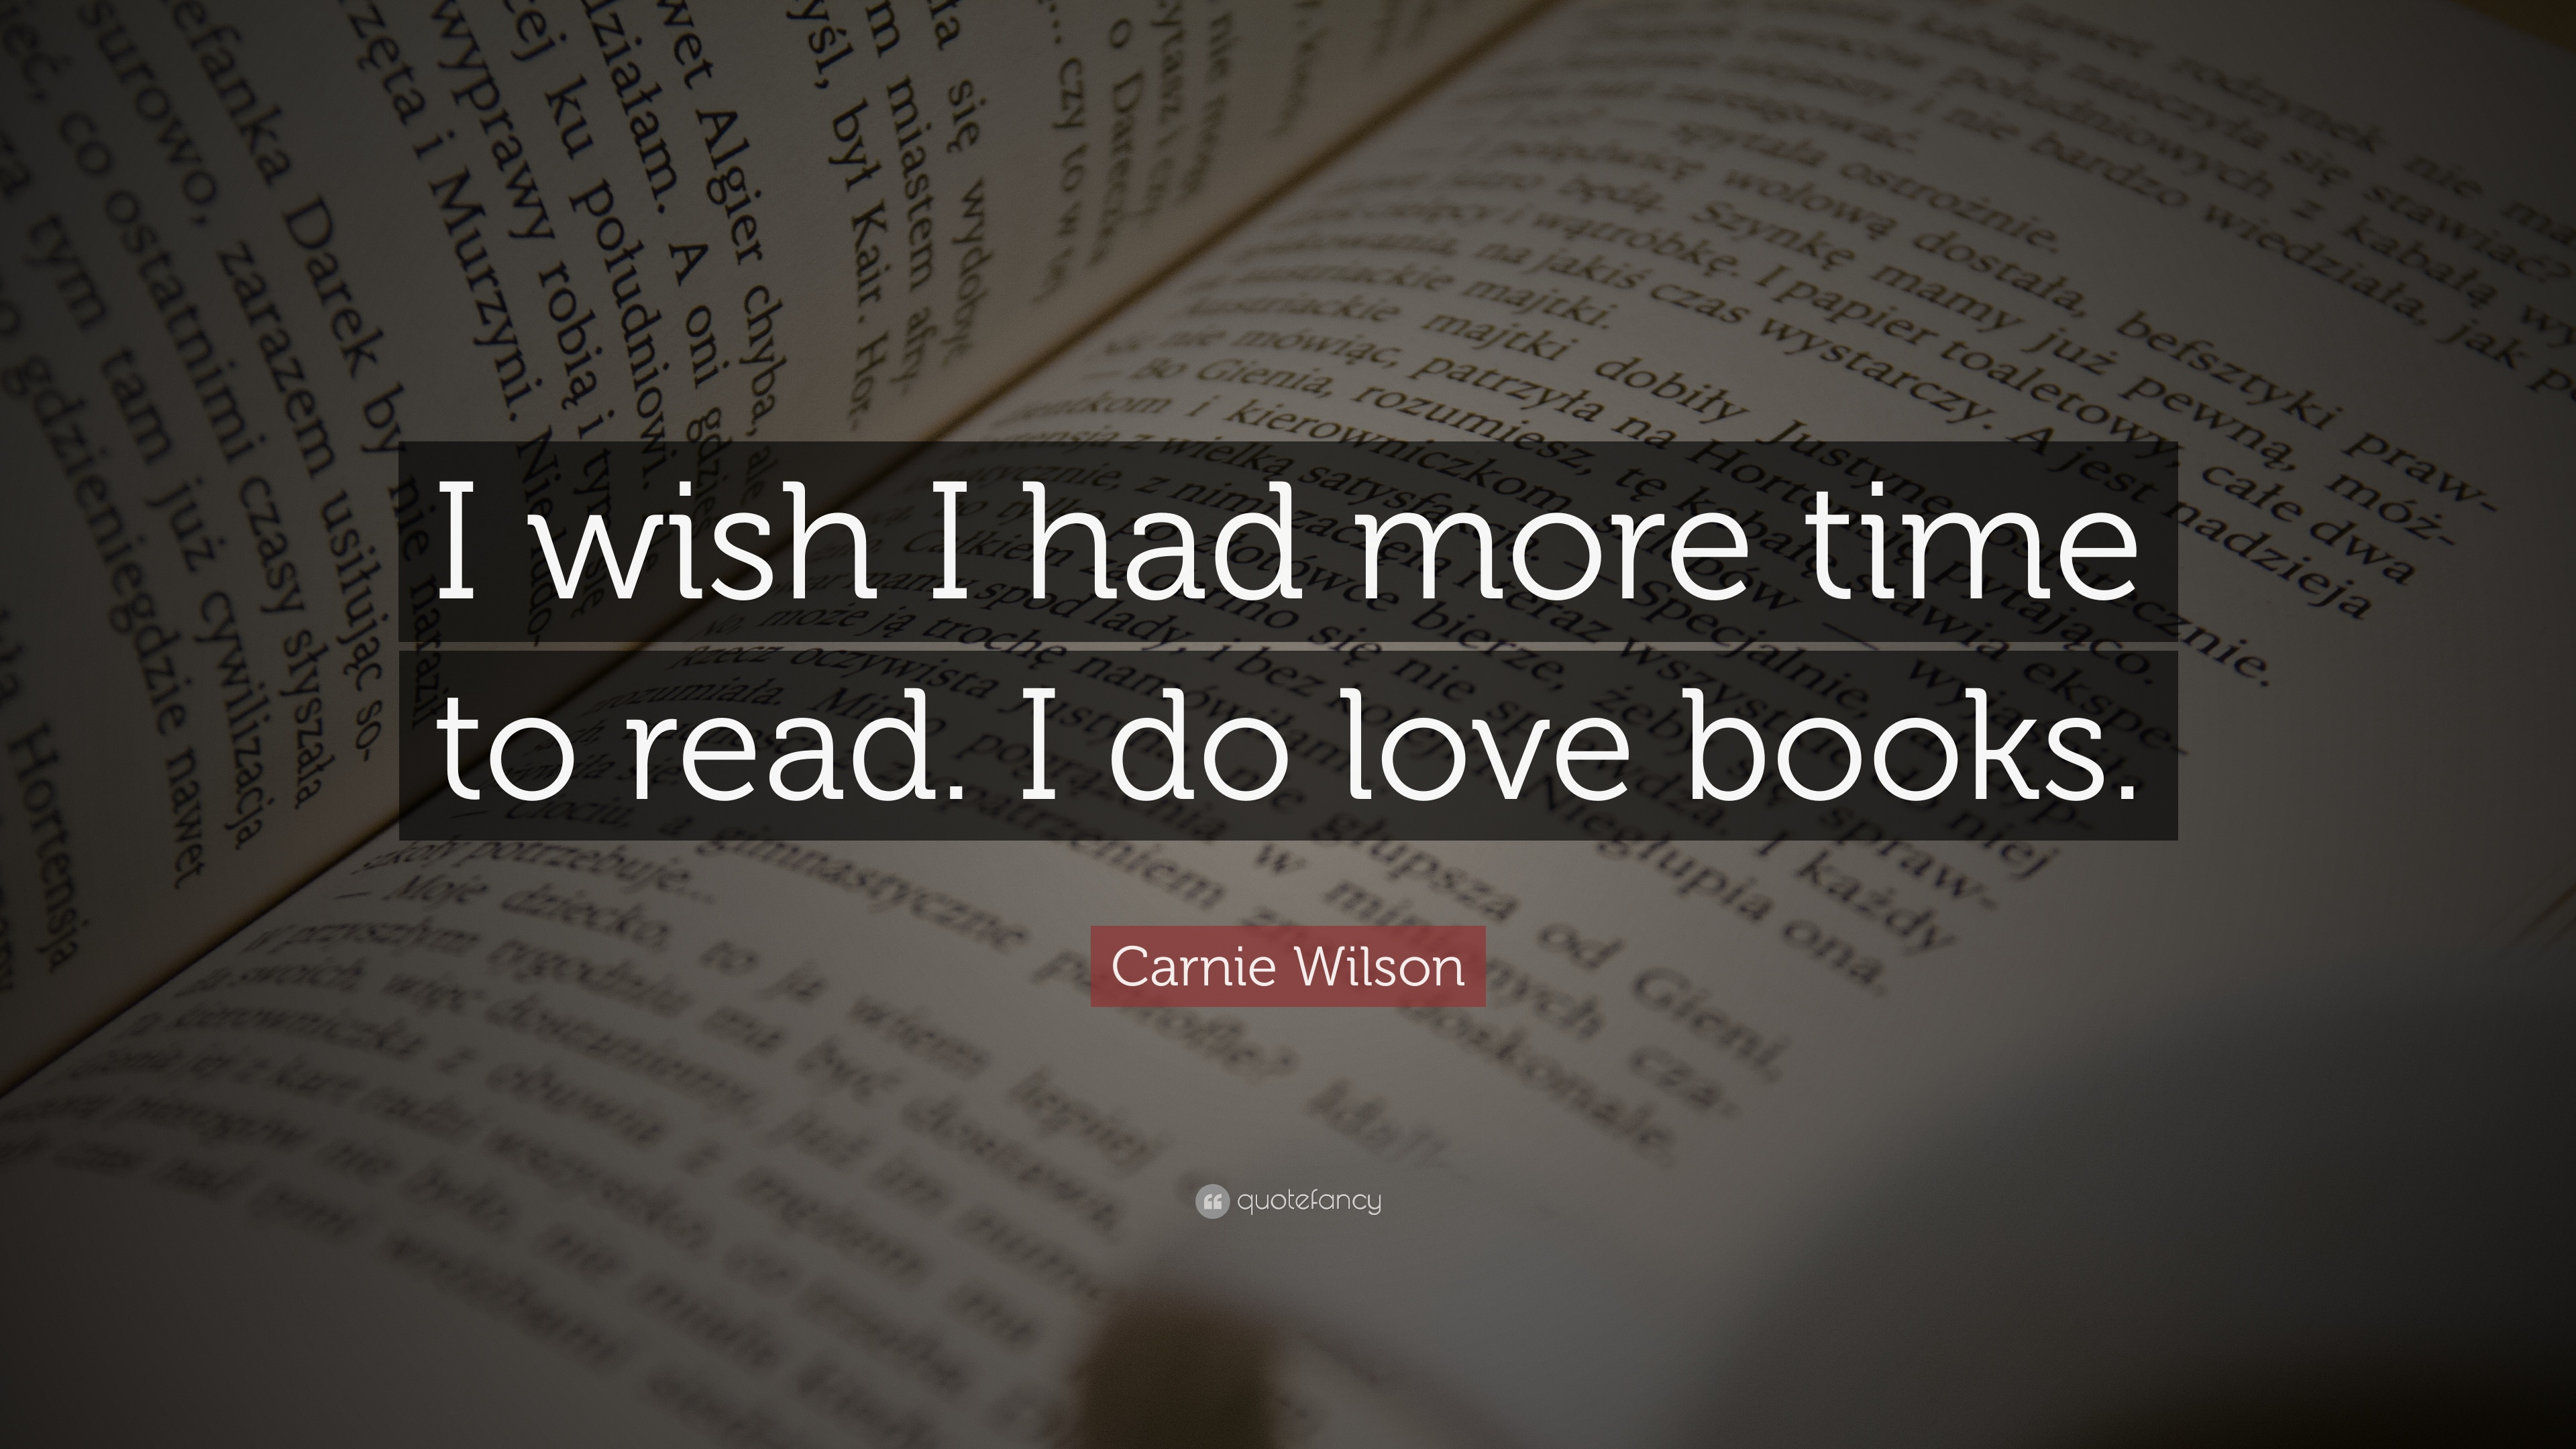 why do i love books